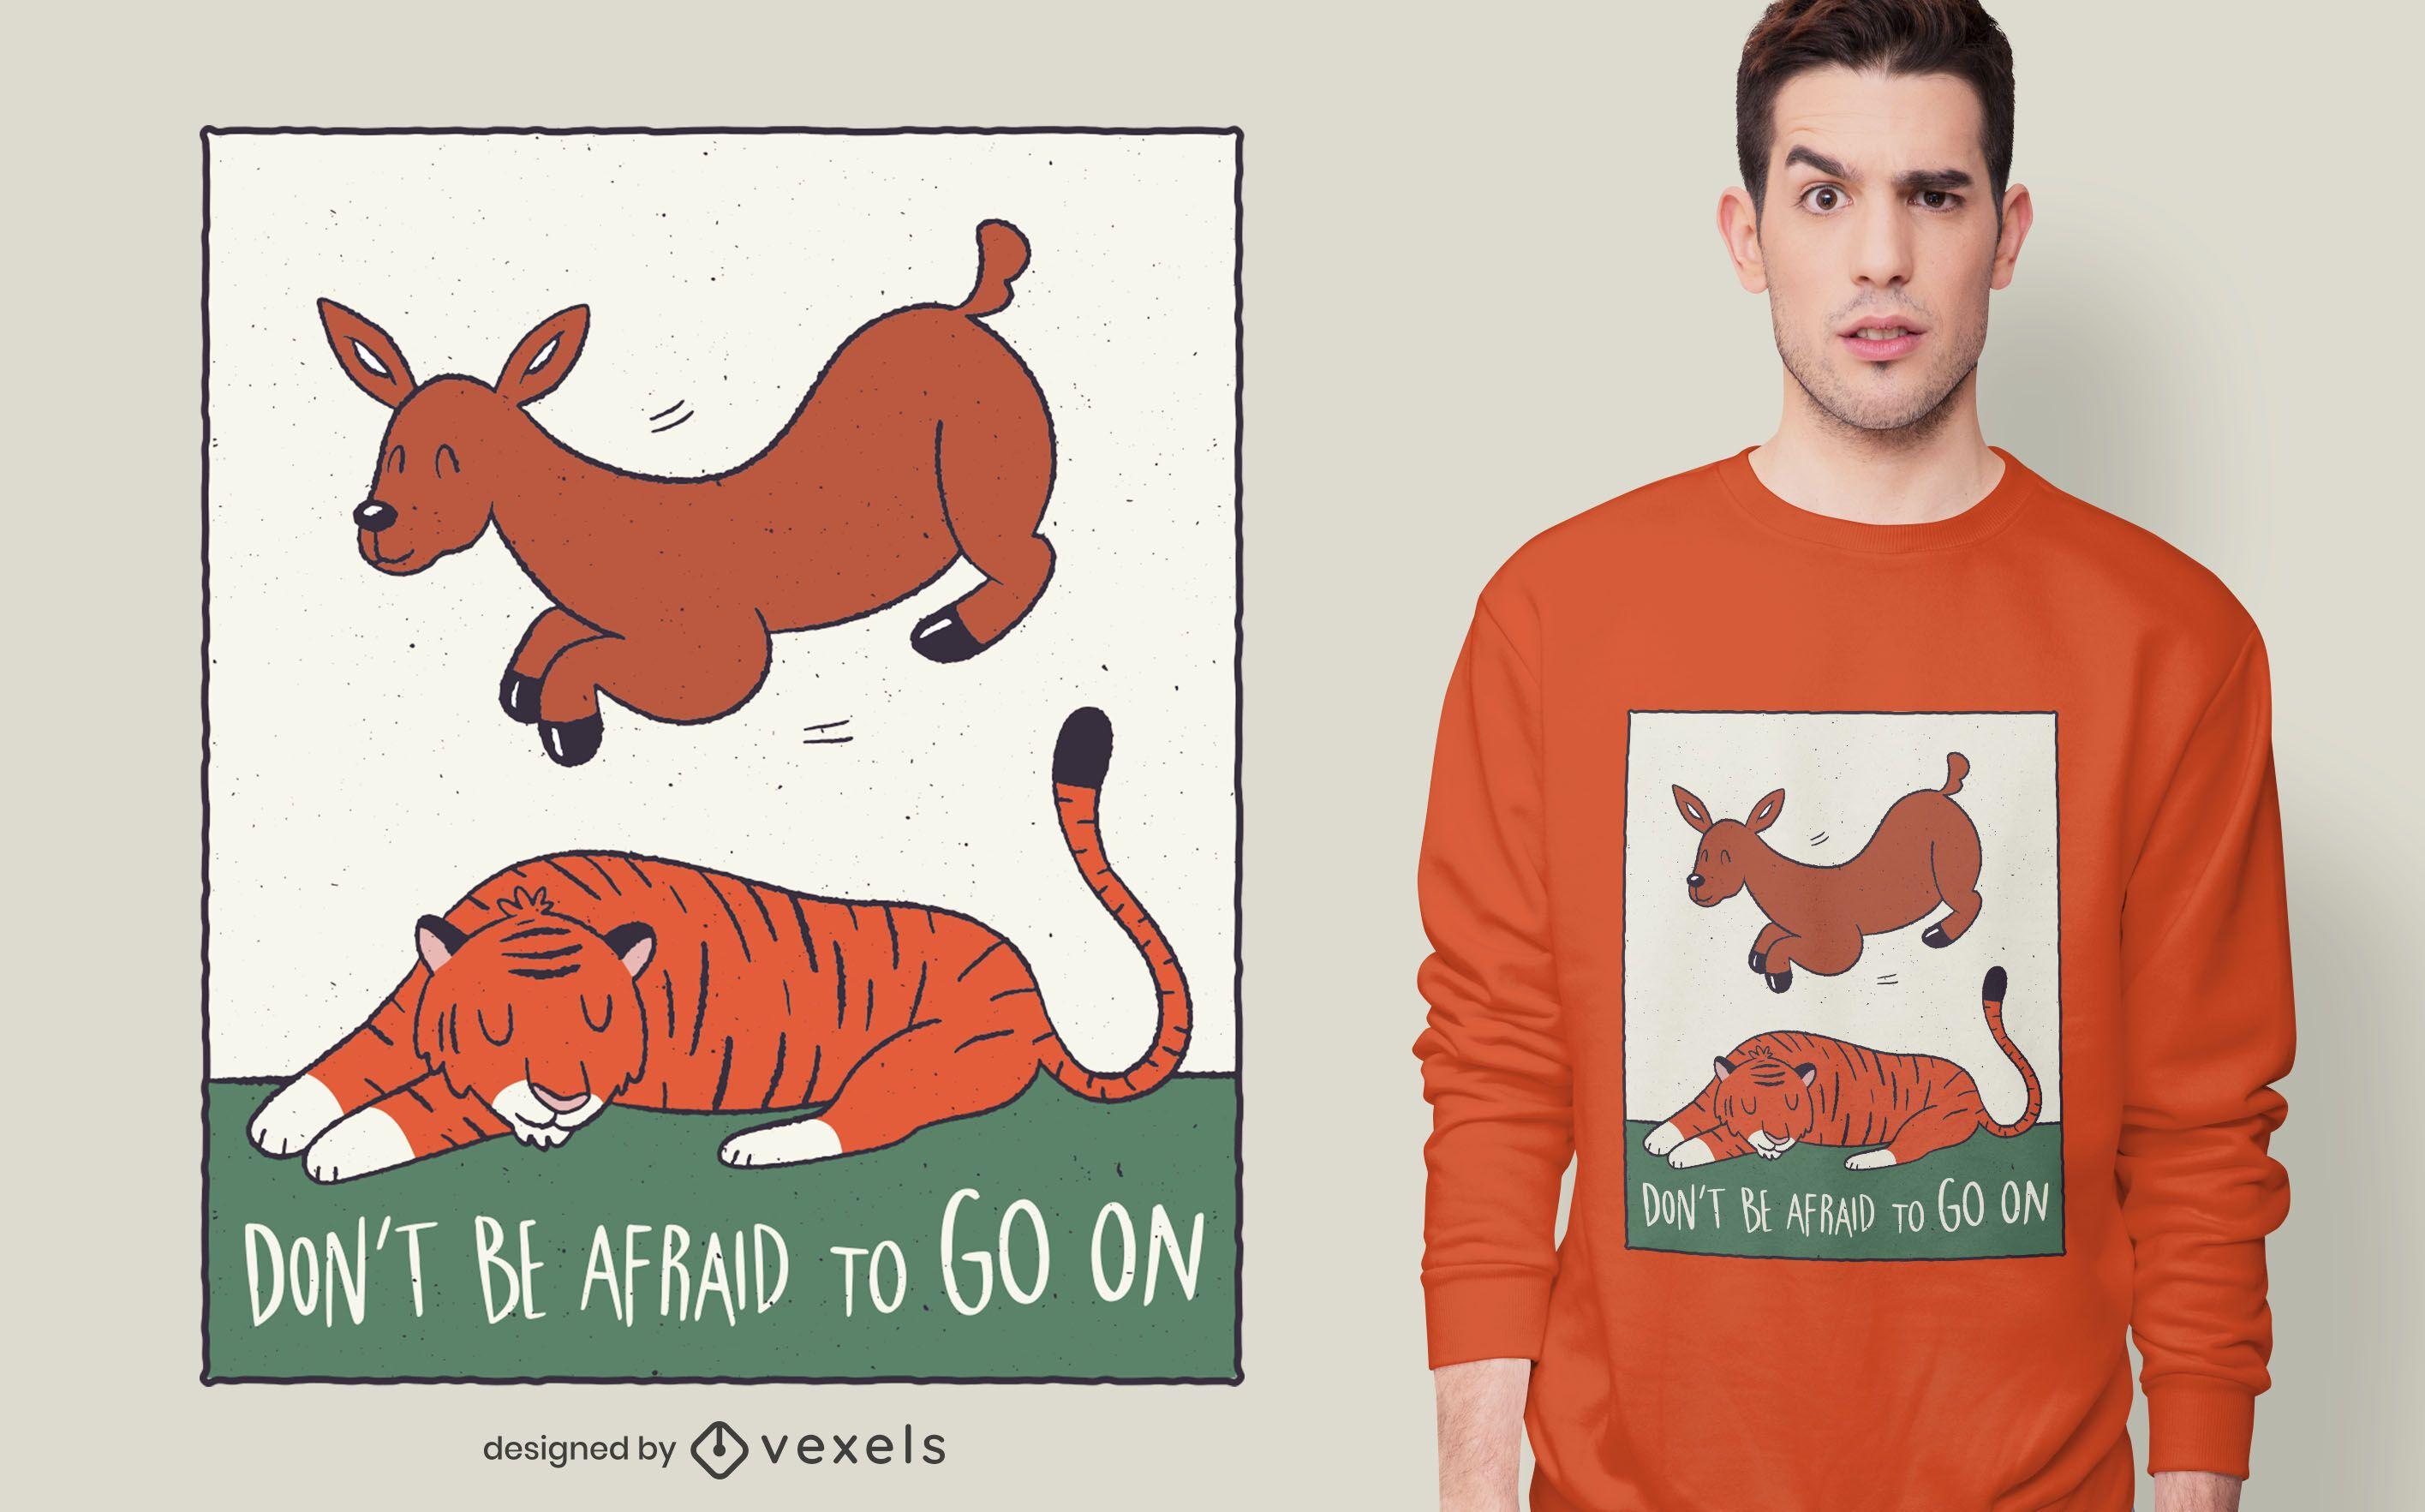 Deer tiger quote t-shirt design